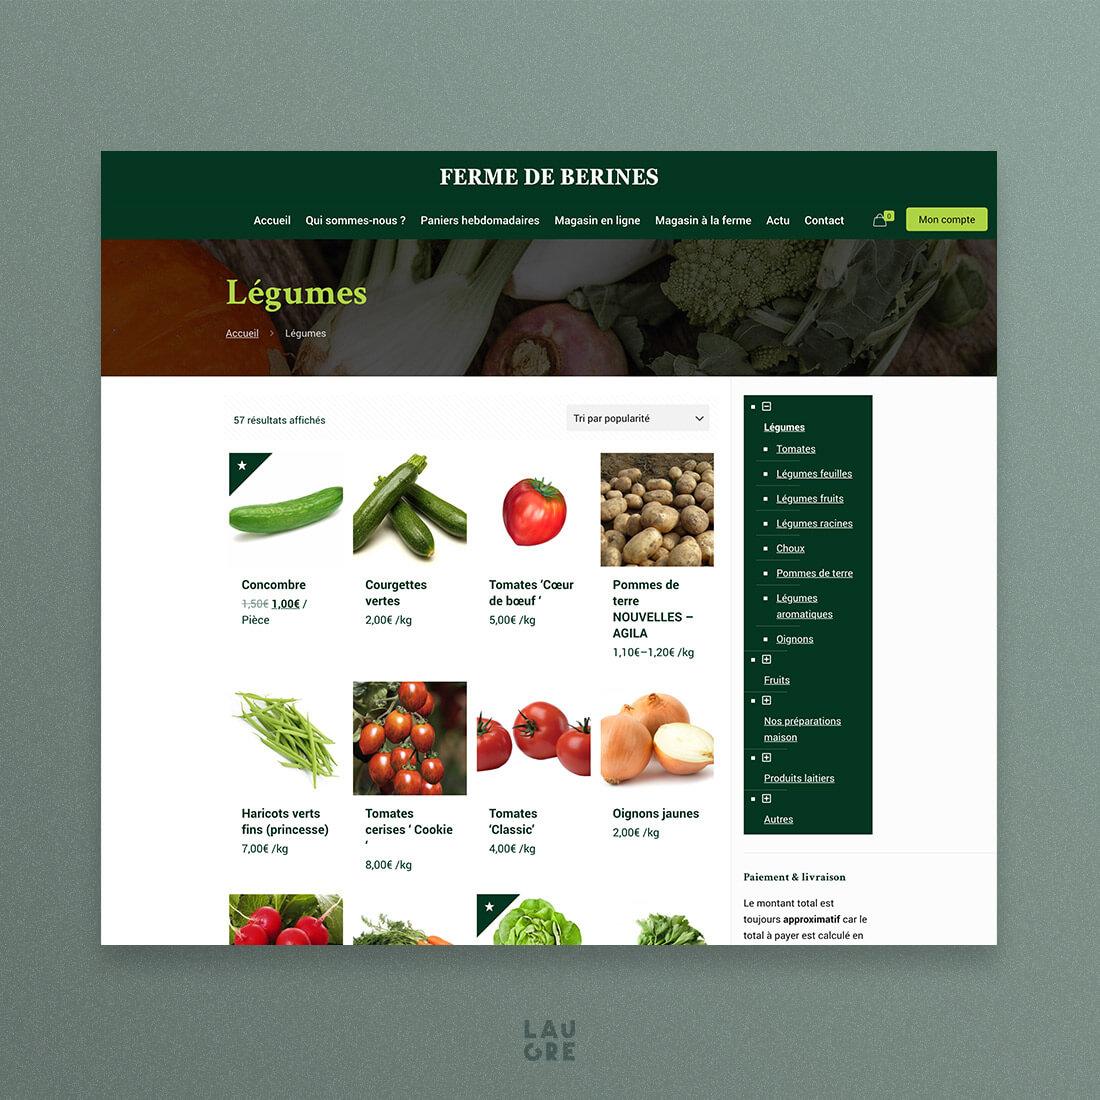 laugre-FermeDeBerines-web-boutique